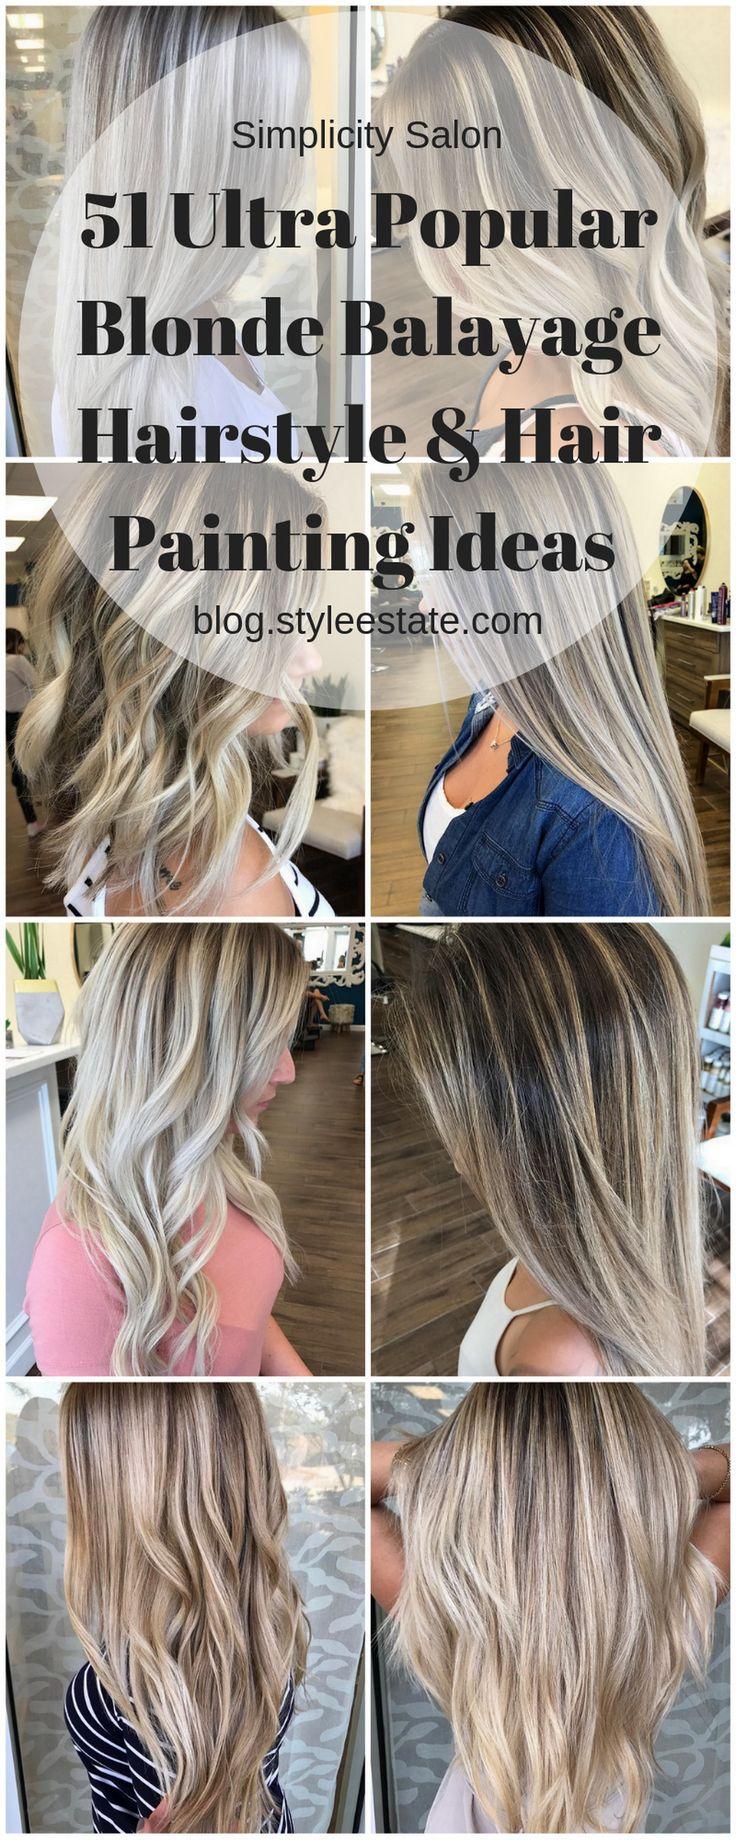 51 Ultra Popular Blonde Balayage Hairstyle & Hair Painting Ideas @simplicitysalon